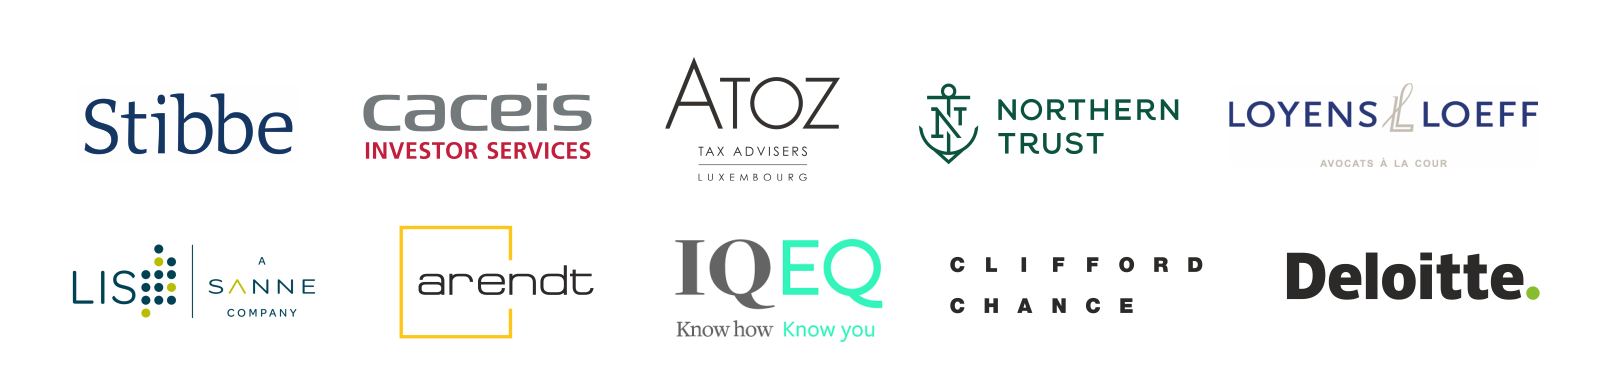 LPEA insights2020-sponsors